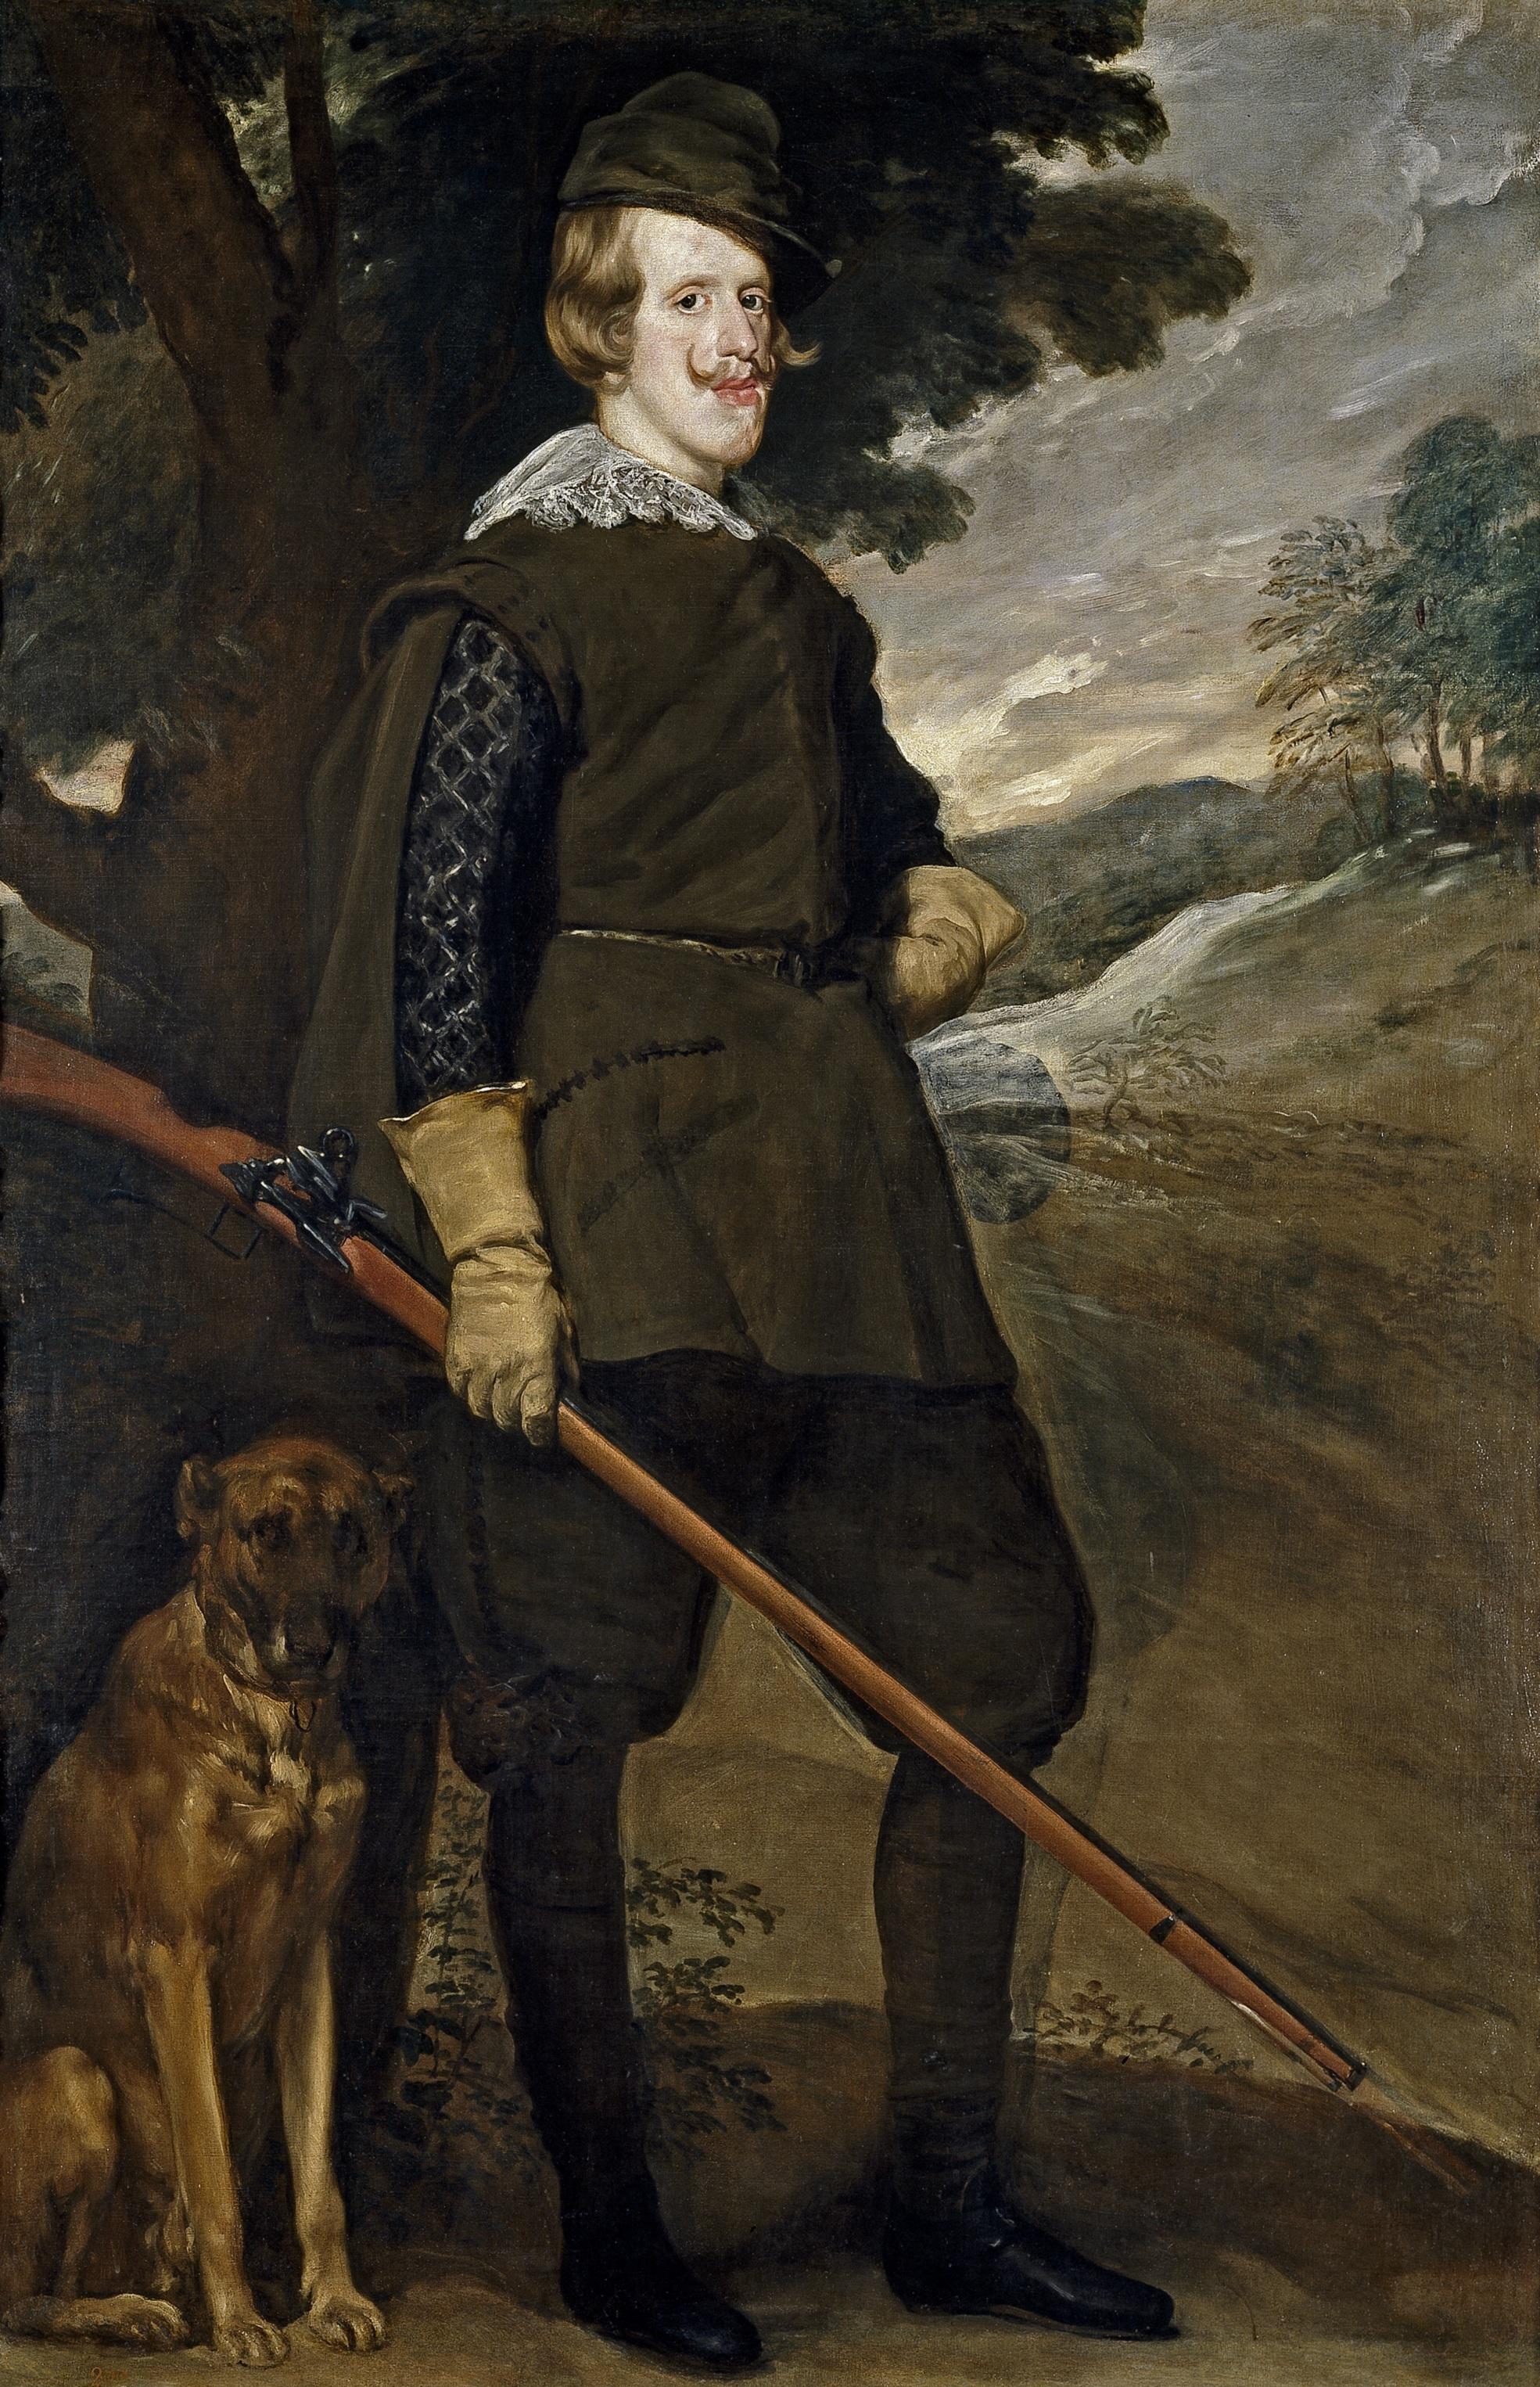 Felipe IV cazador - Wikipedia, la enciclopedia libre